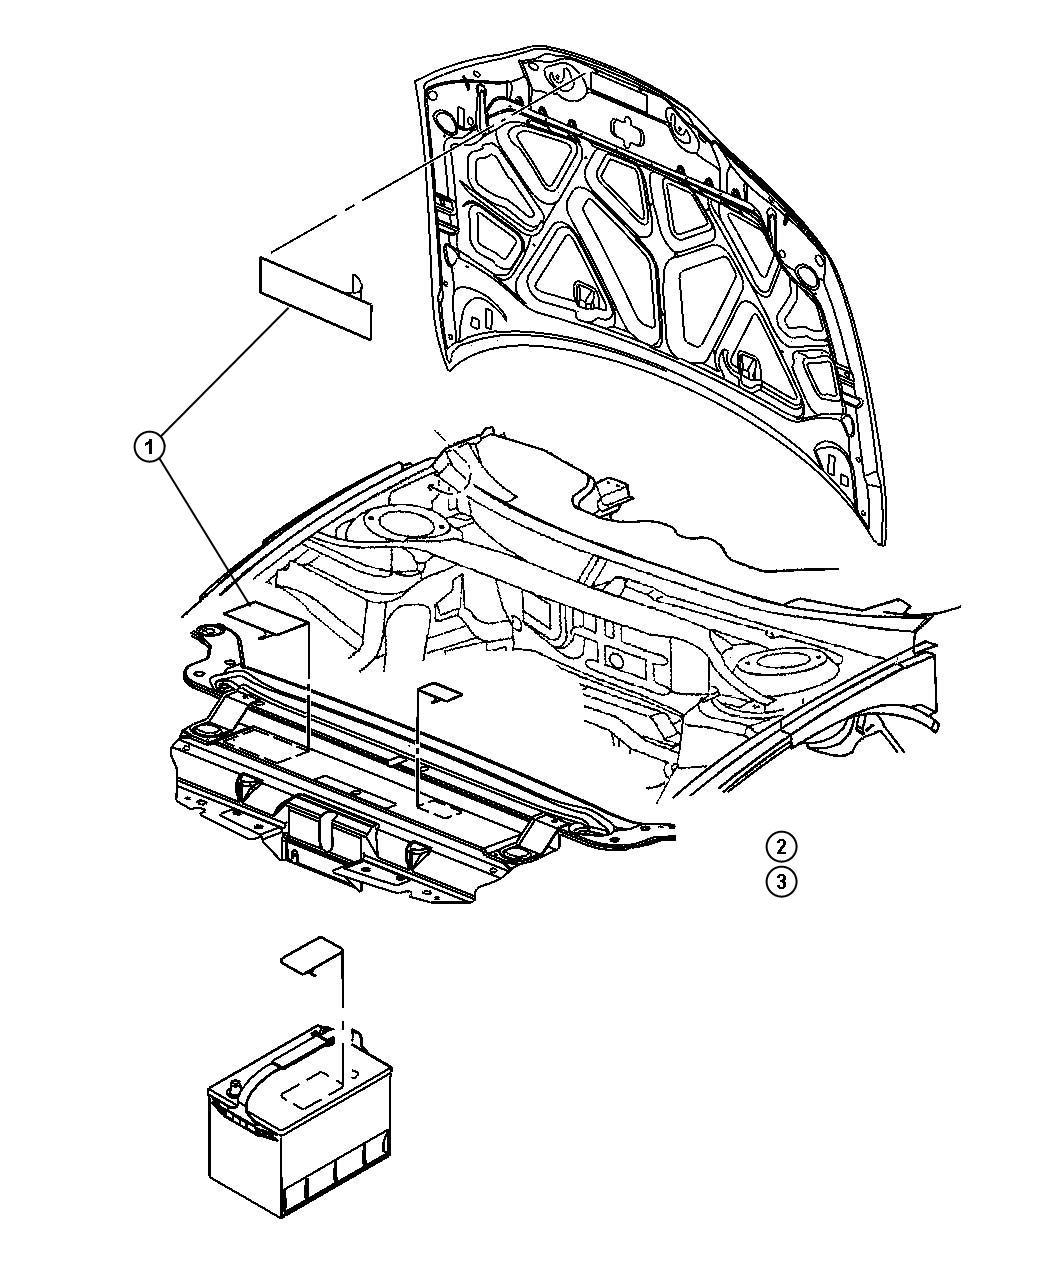 Jeep Liberty Label. Brake fluid warning, master cylinder